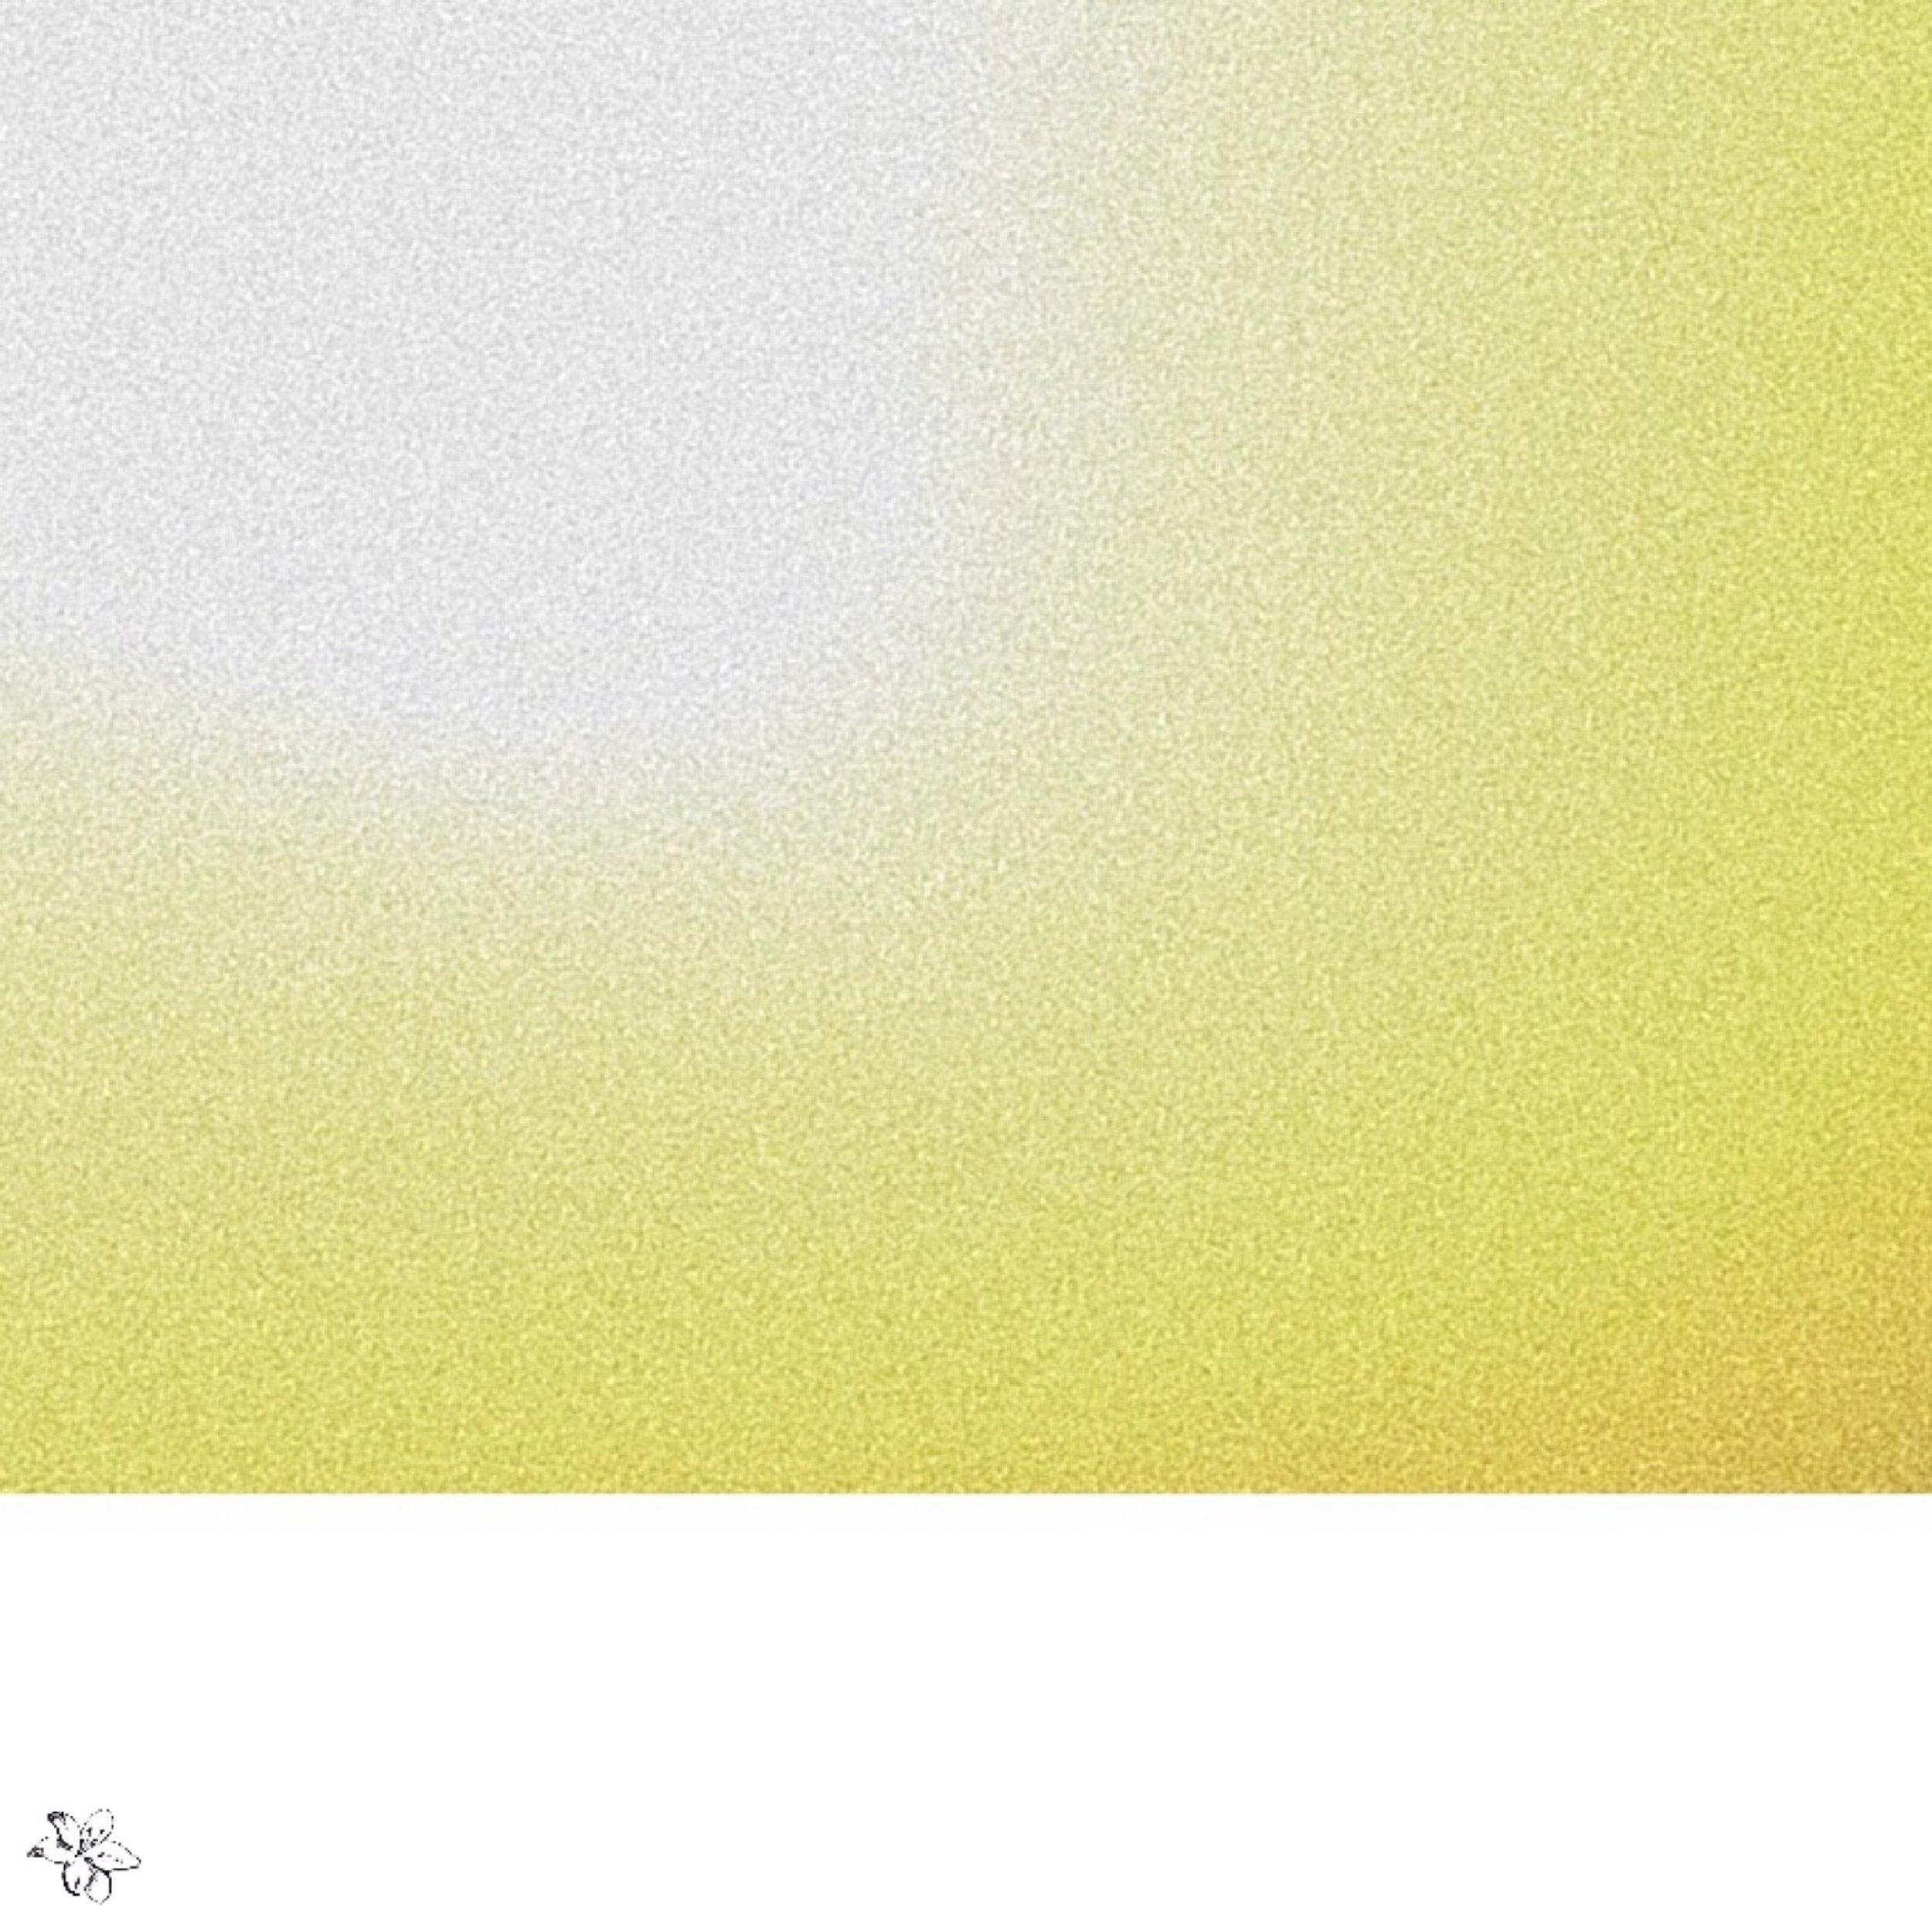 DIRECT SUNLIGHT - seventhgaze